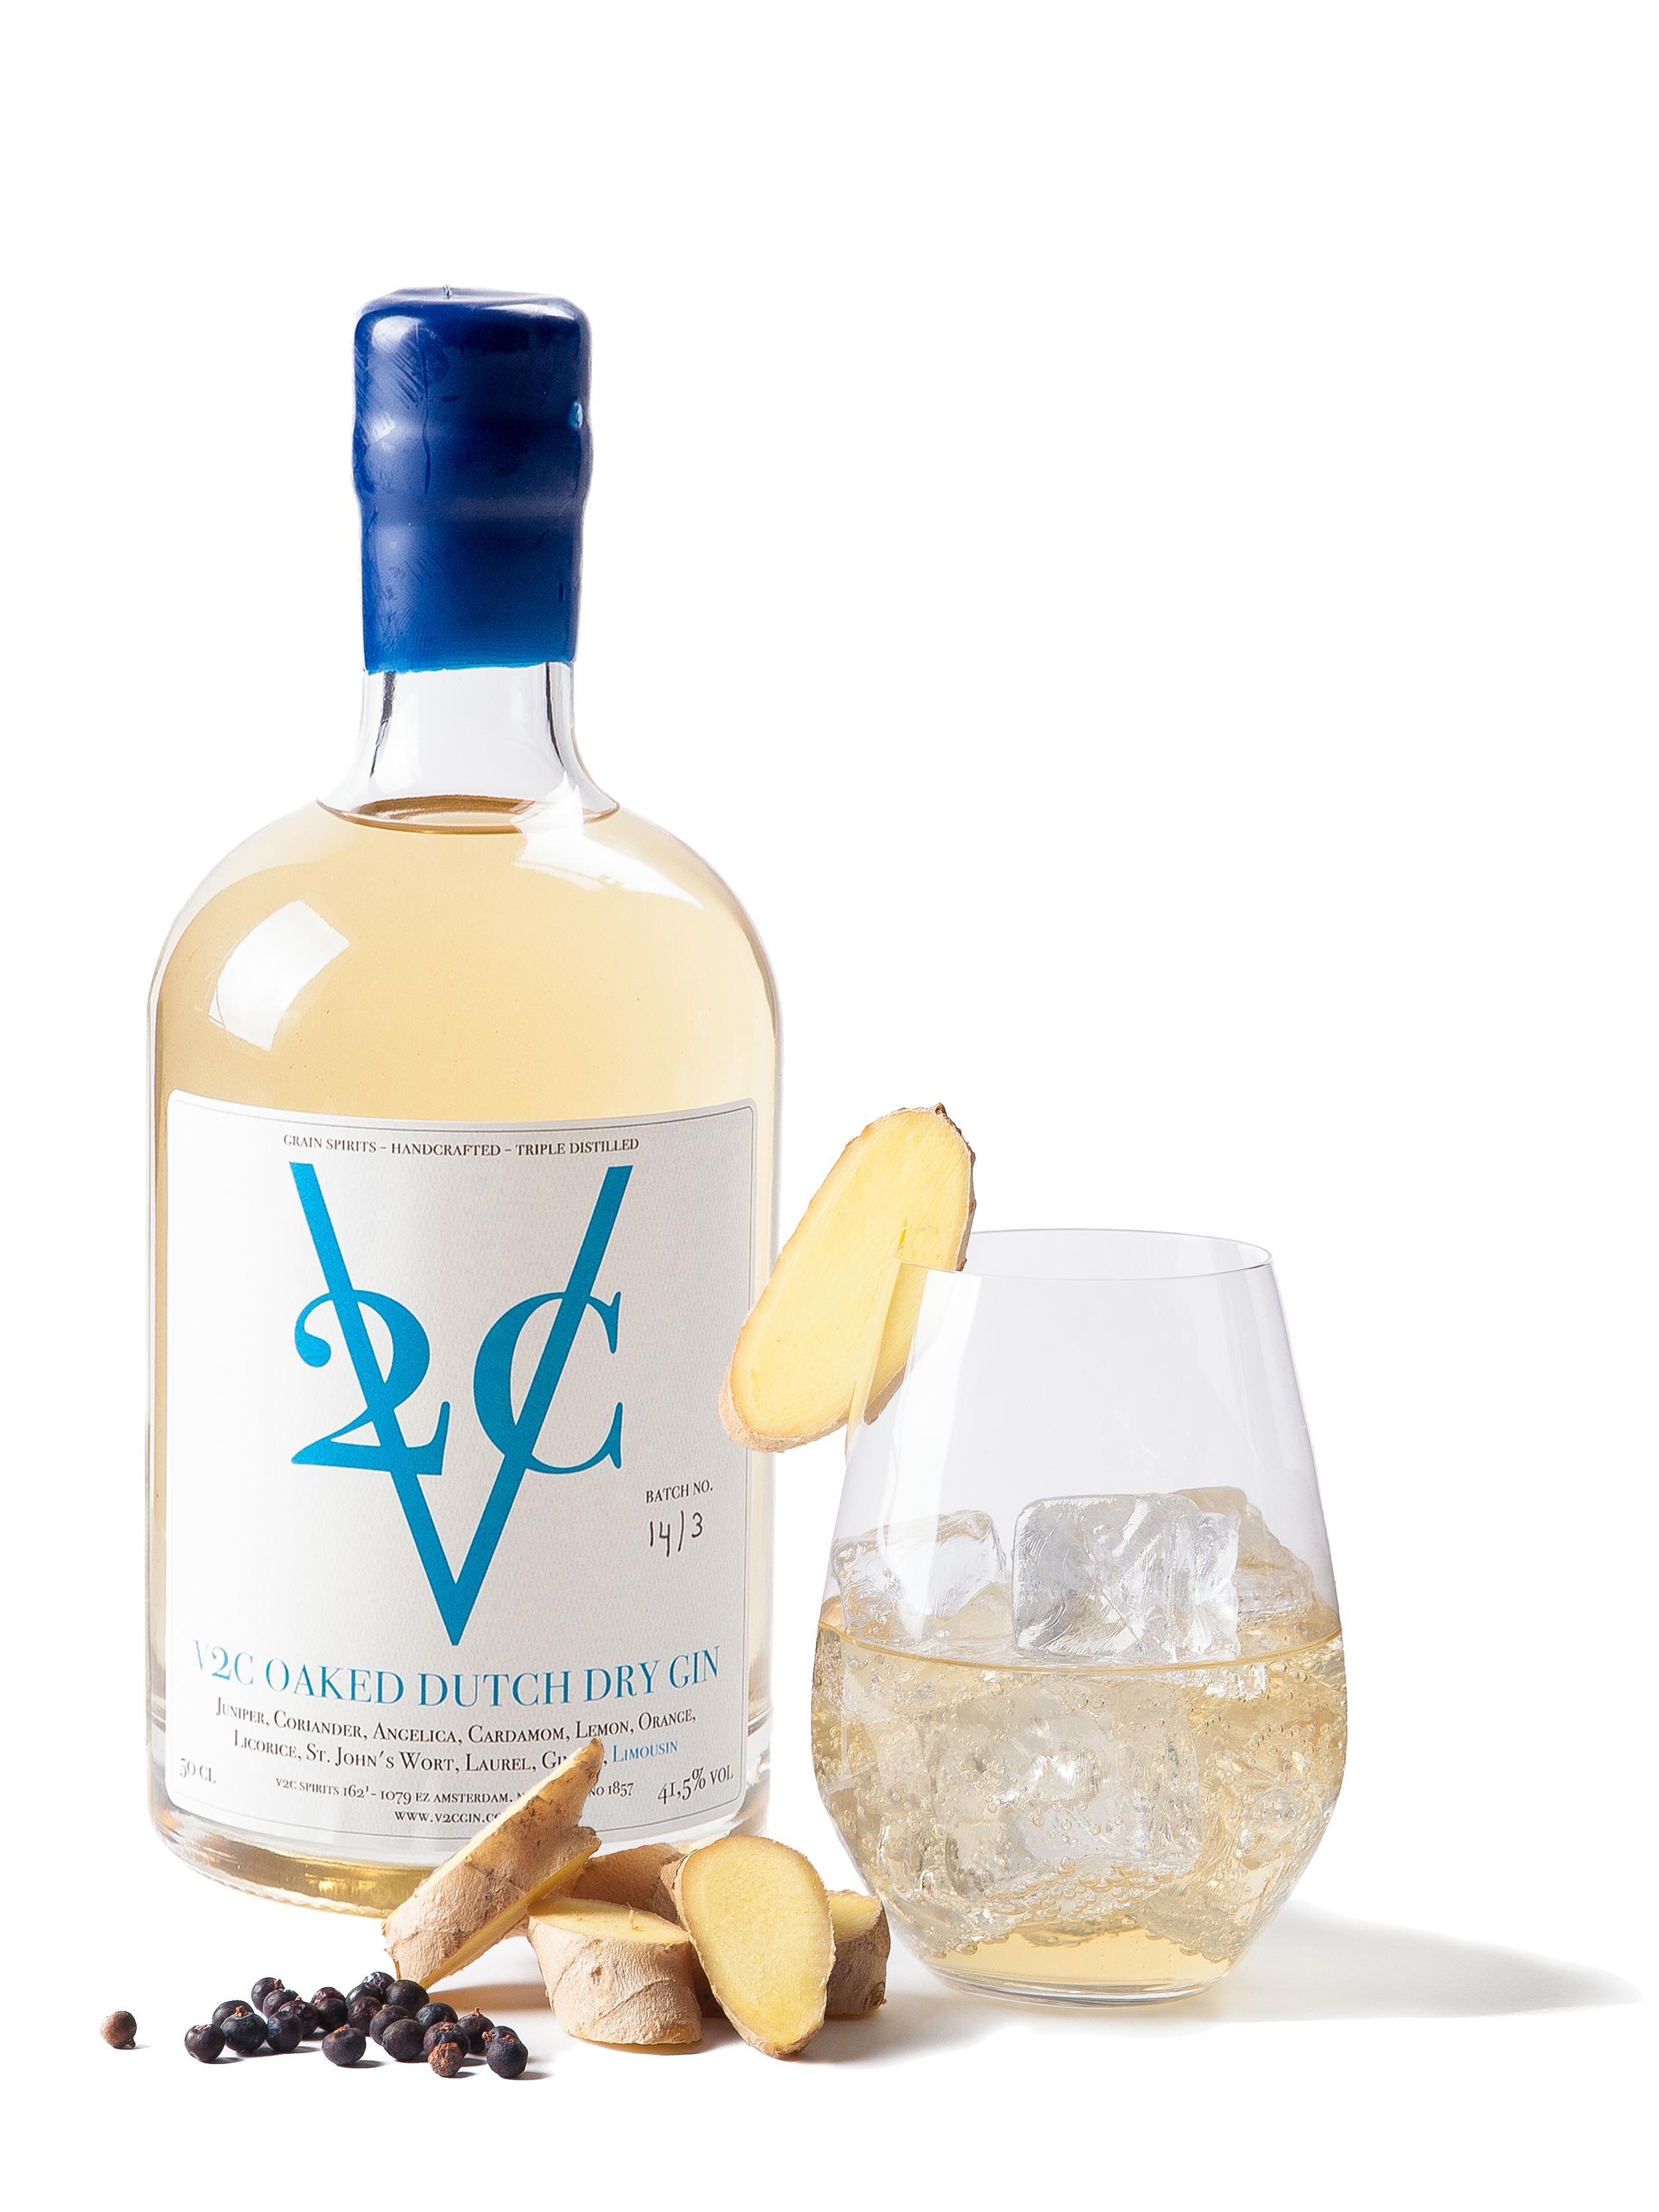 V2C-Oaked-Dutch-Dry-Gin